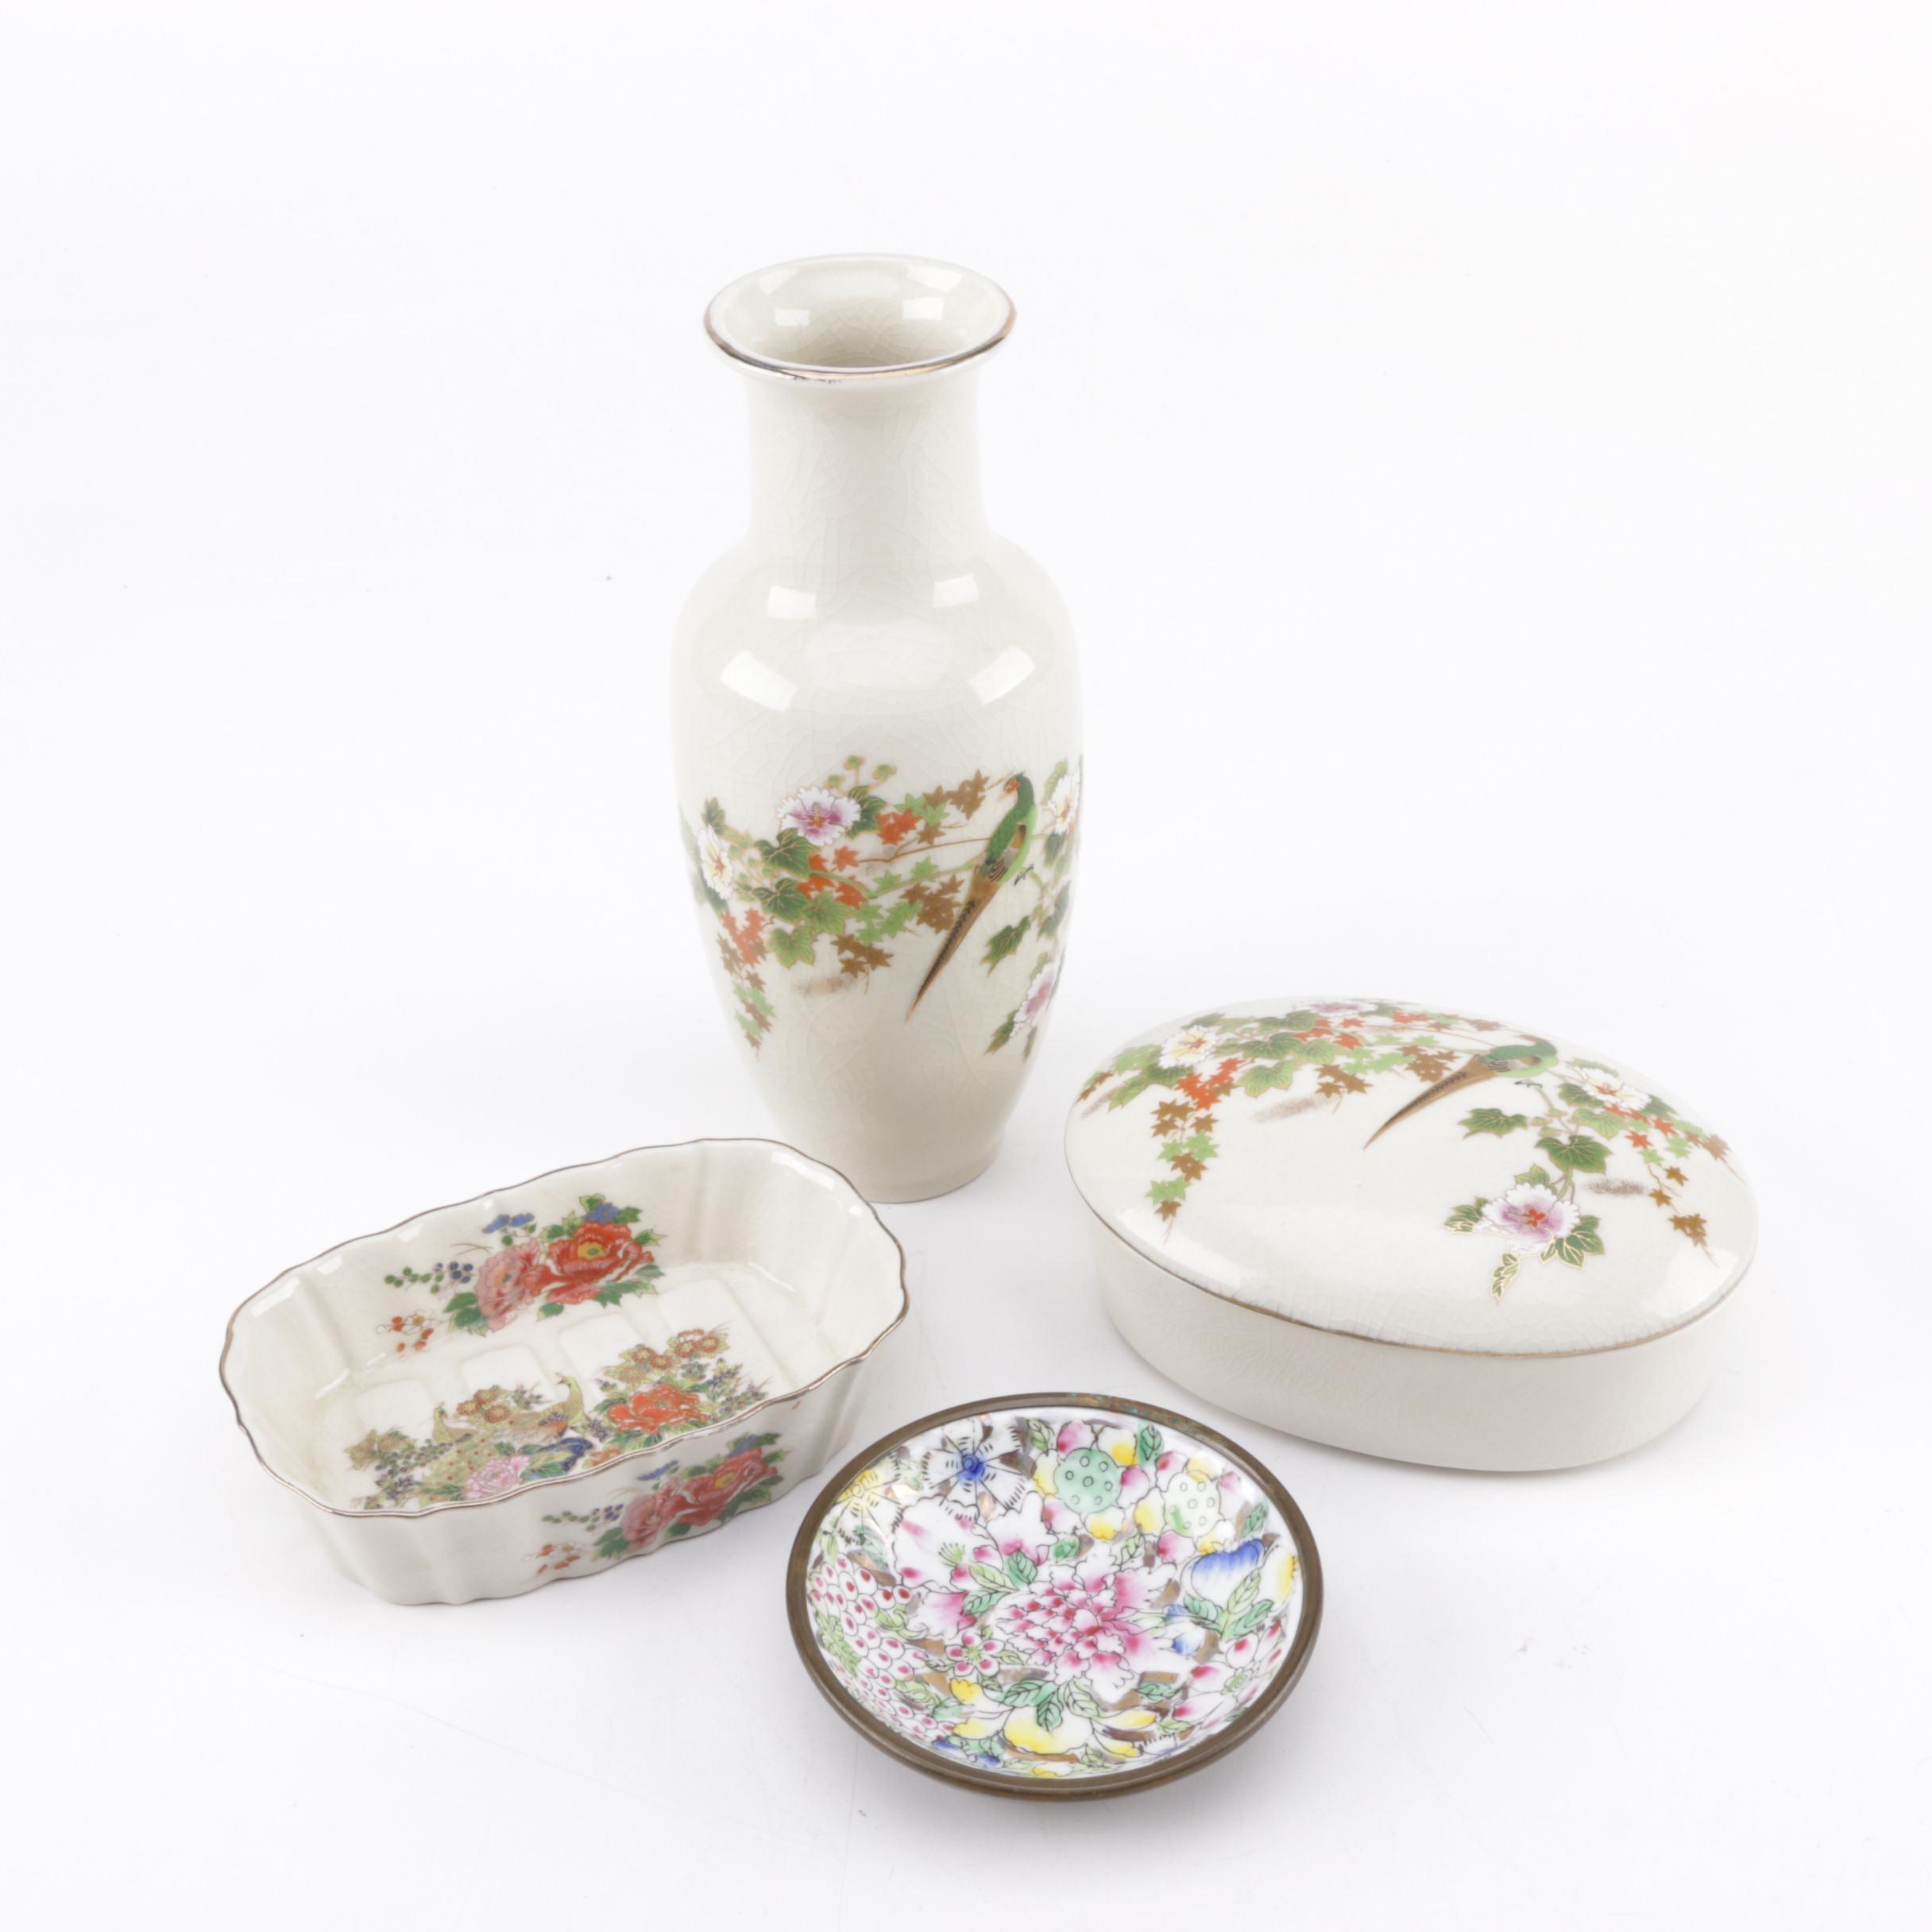 Set of Chinoiserie Ceramic Pieces